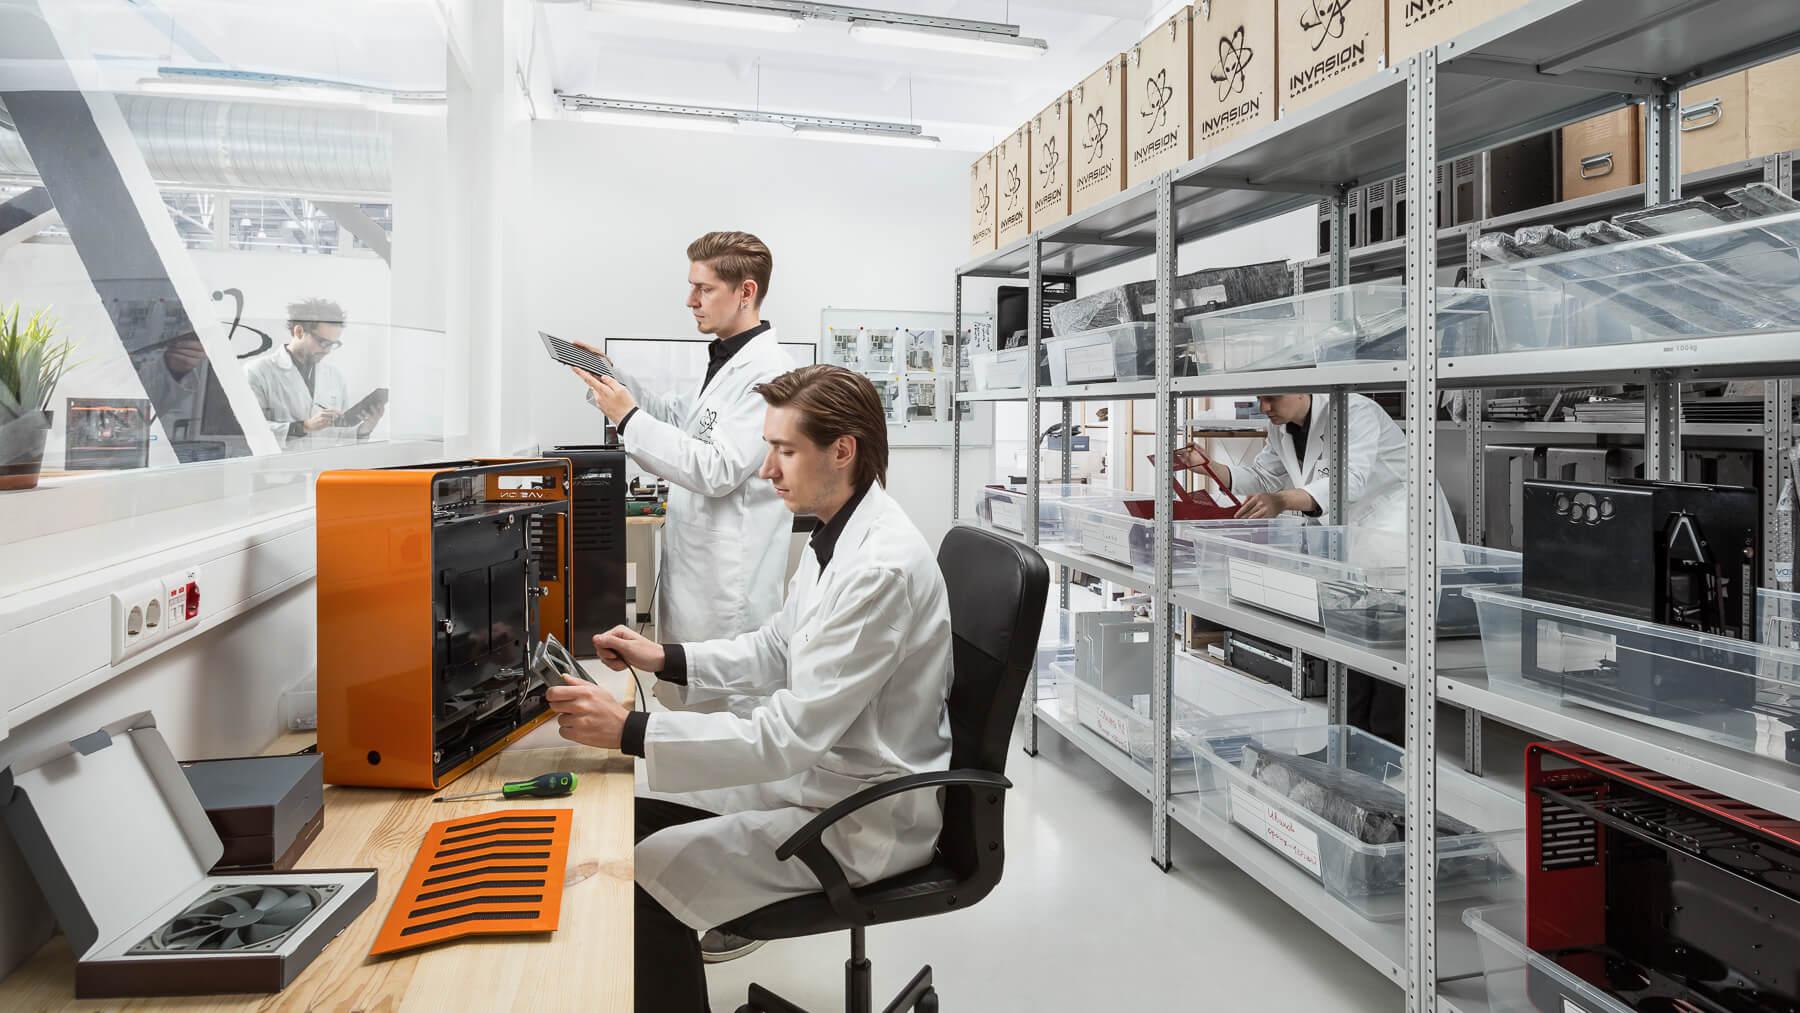 Экскурсия по INVASION Labs: сборка корпусов